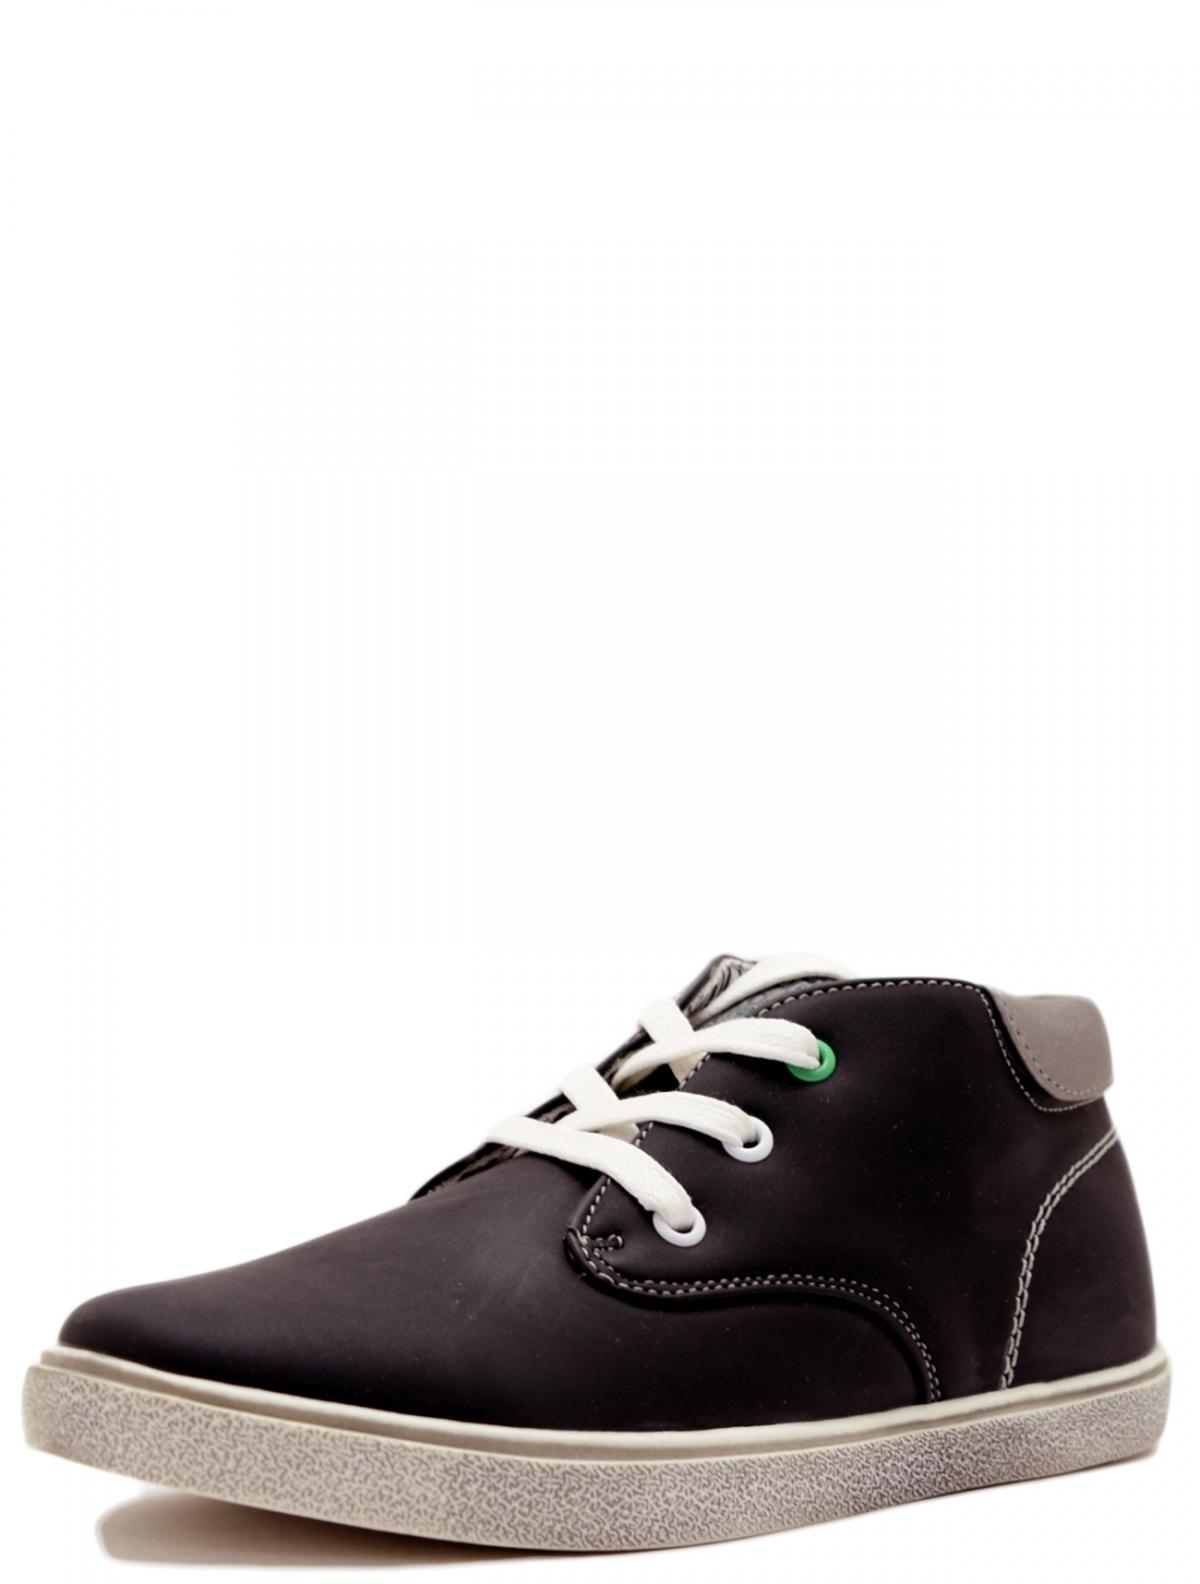 R019516650-BK туфли для мальчика